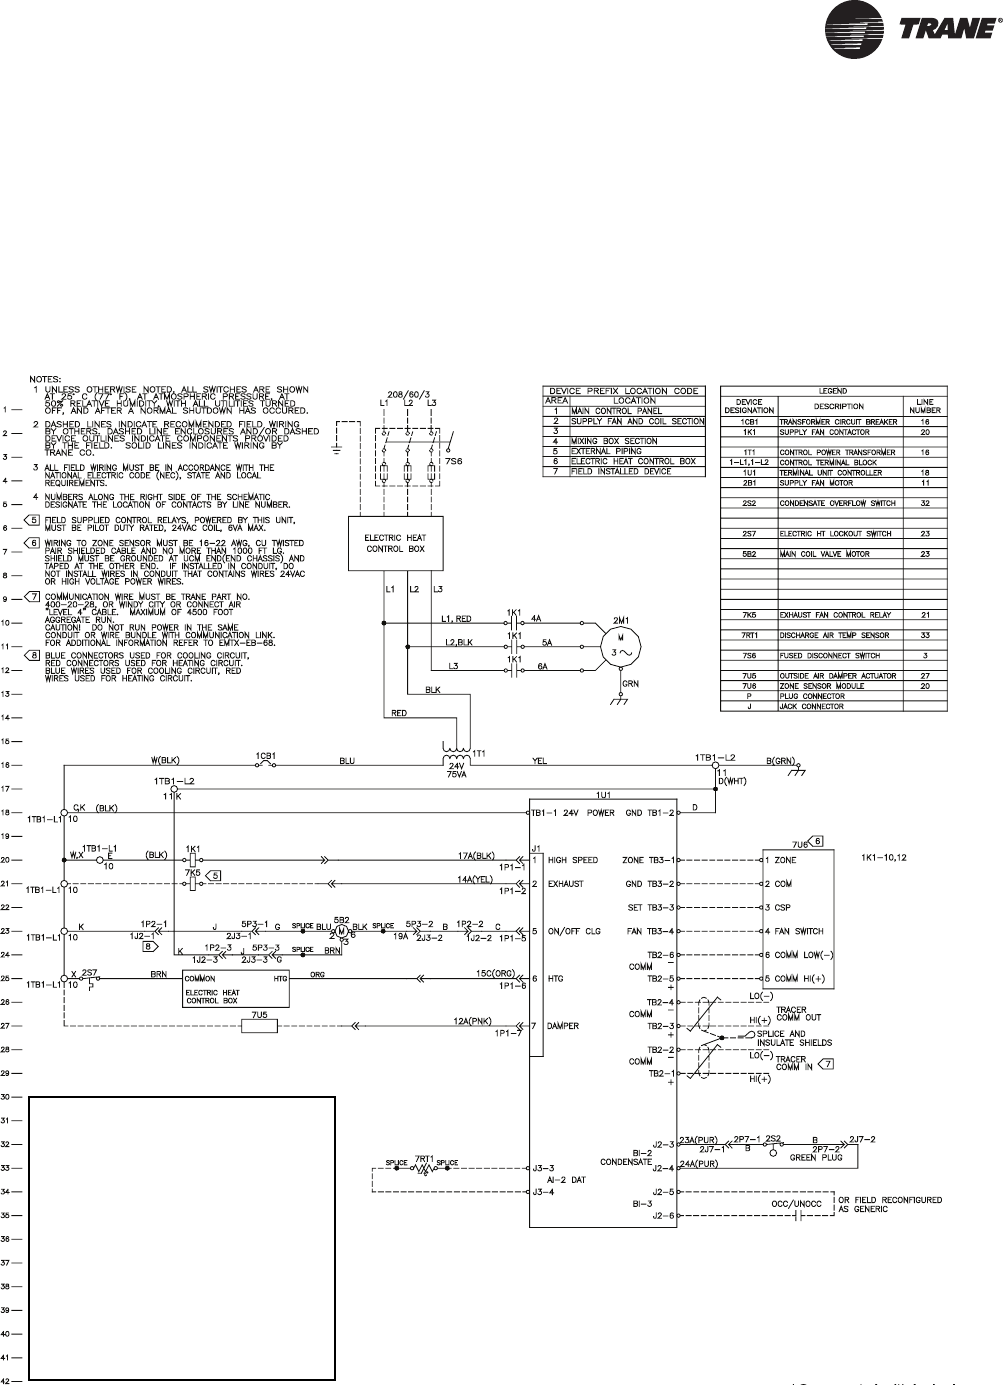 Trane Bchc Bcvc Bcxc Svx01b En Wiring Diagrams Fan Coil Unit Diagram Two Pipe With Tracer Zn510